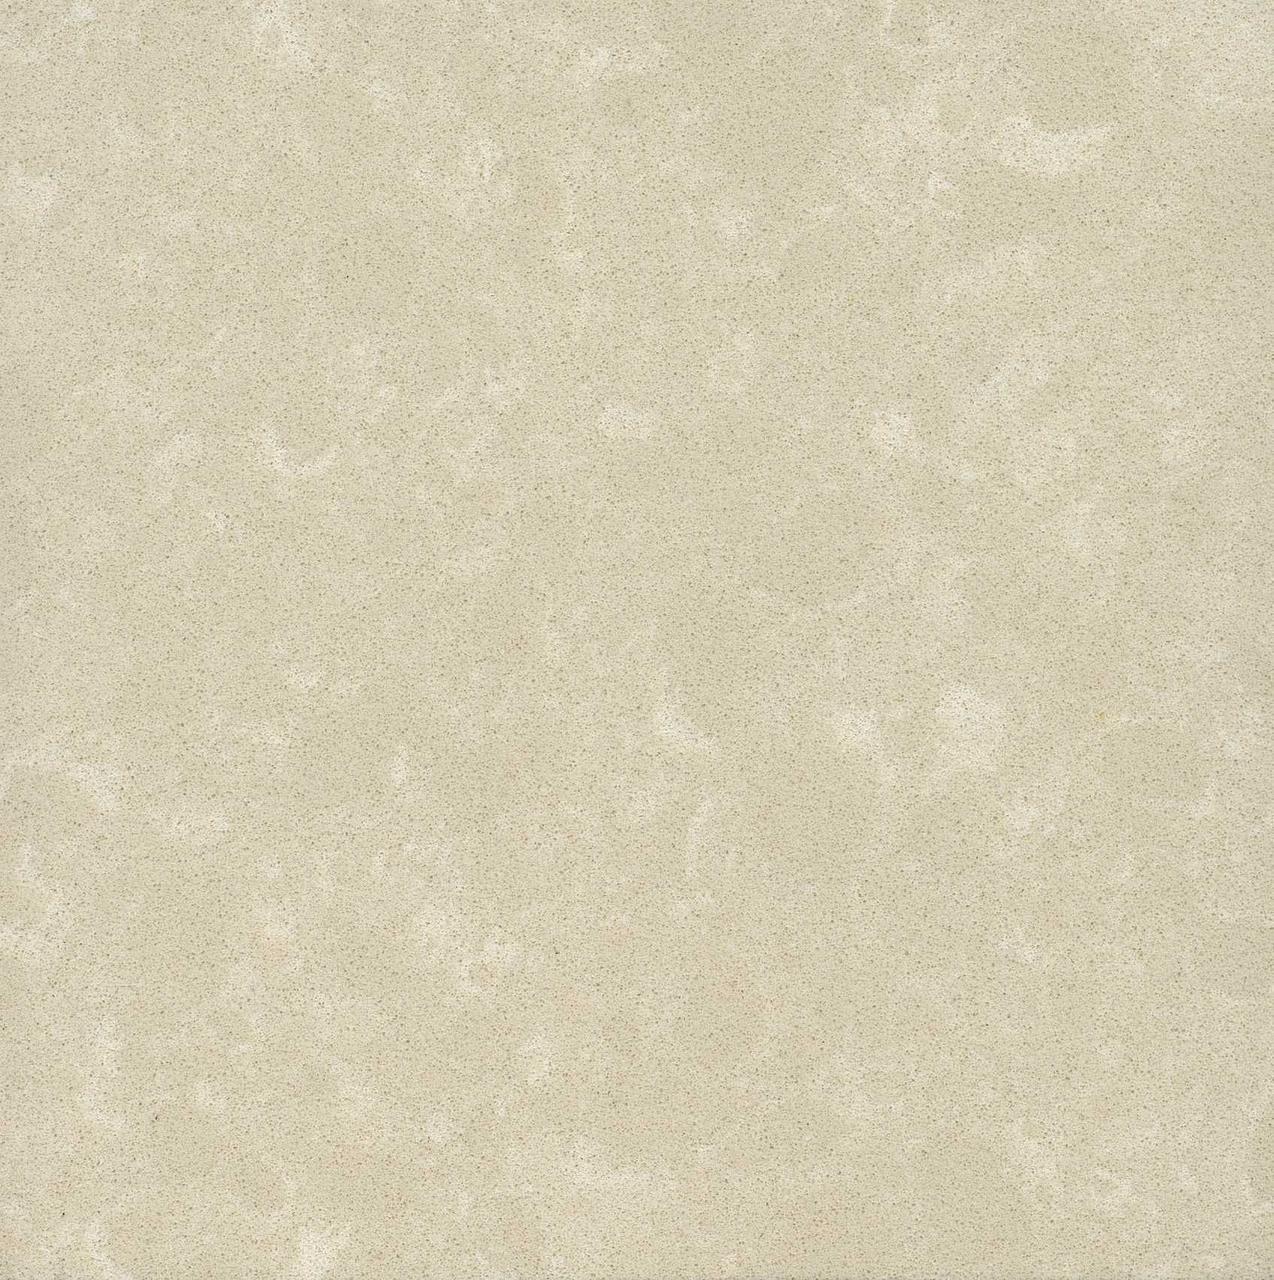 Искусственный камень, Кварц Silestone Tigris Sand 20 мм